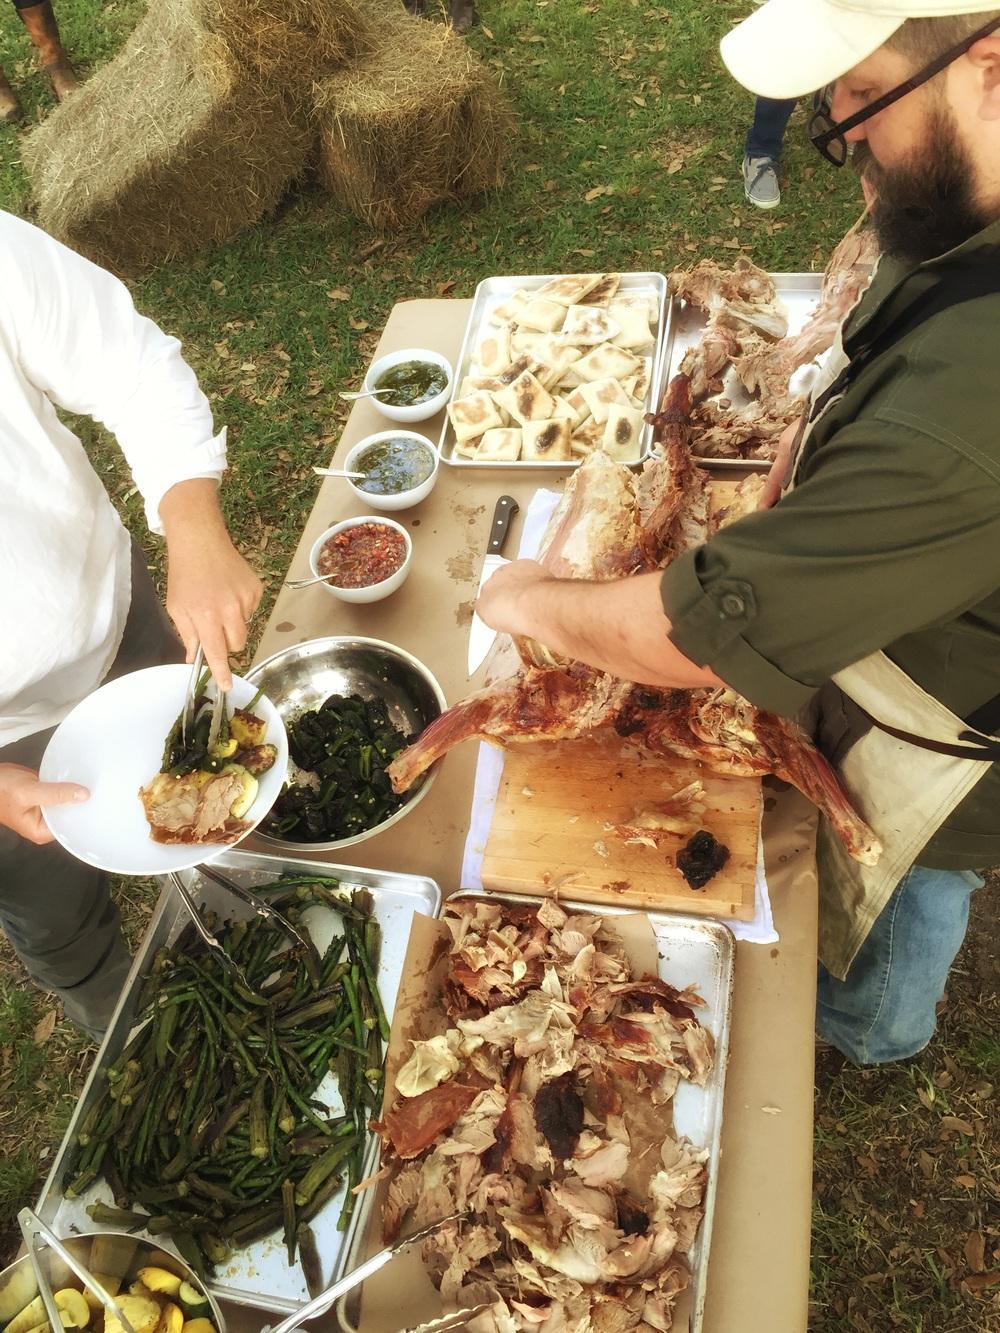 Lamb asador charred vegetables and sauces.